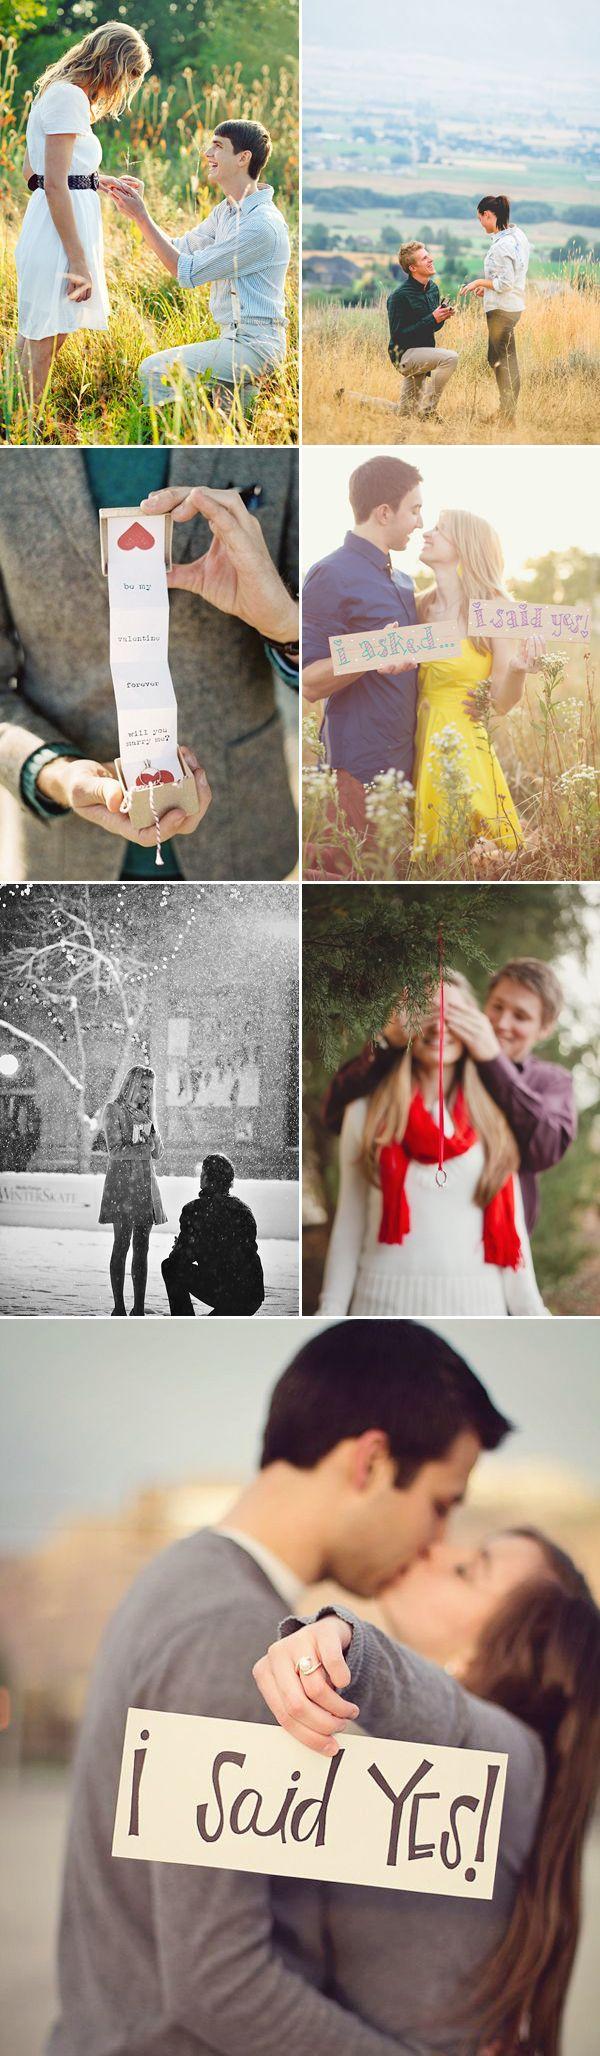 188 best wedding ideas images on pinterest | couples, engagement